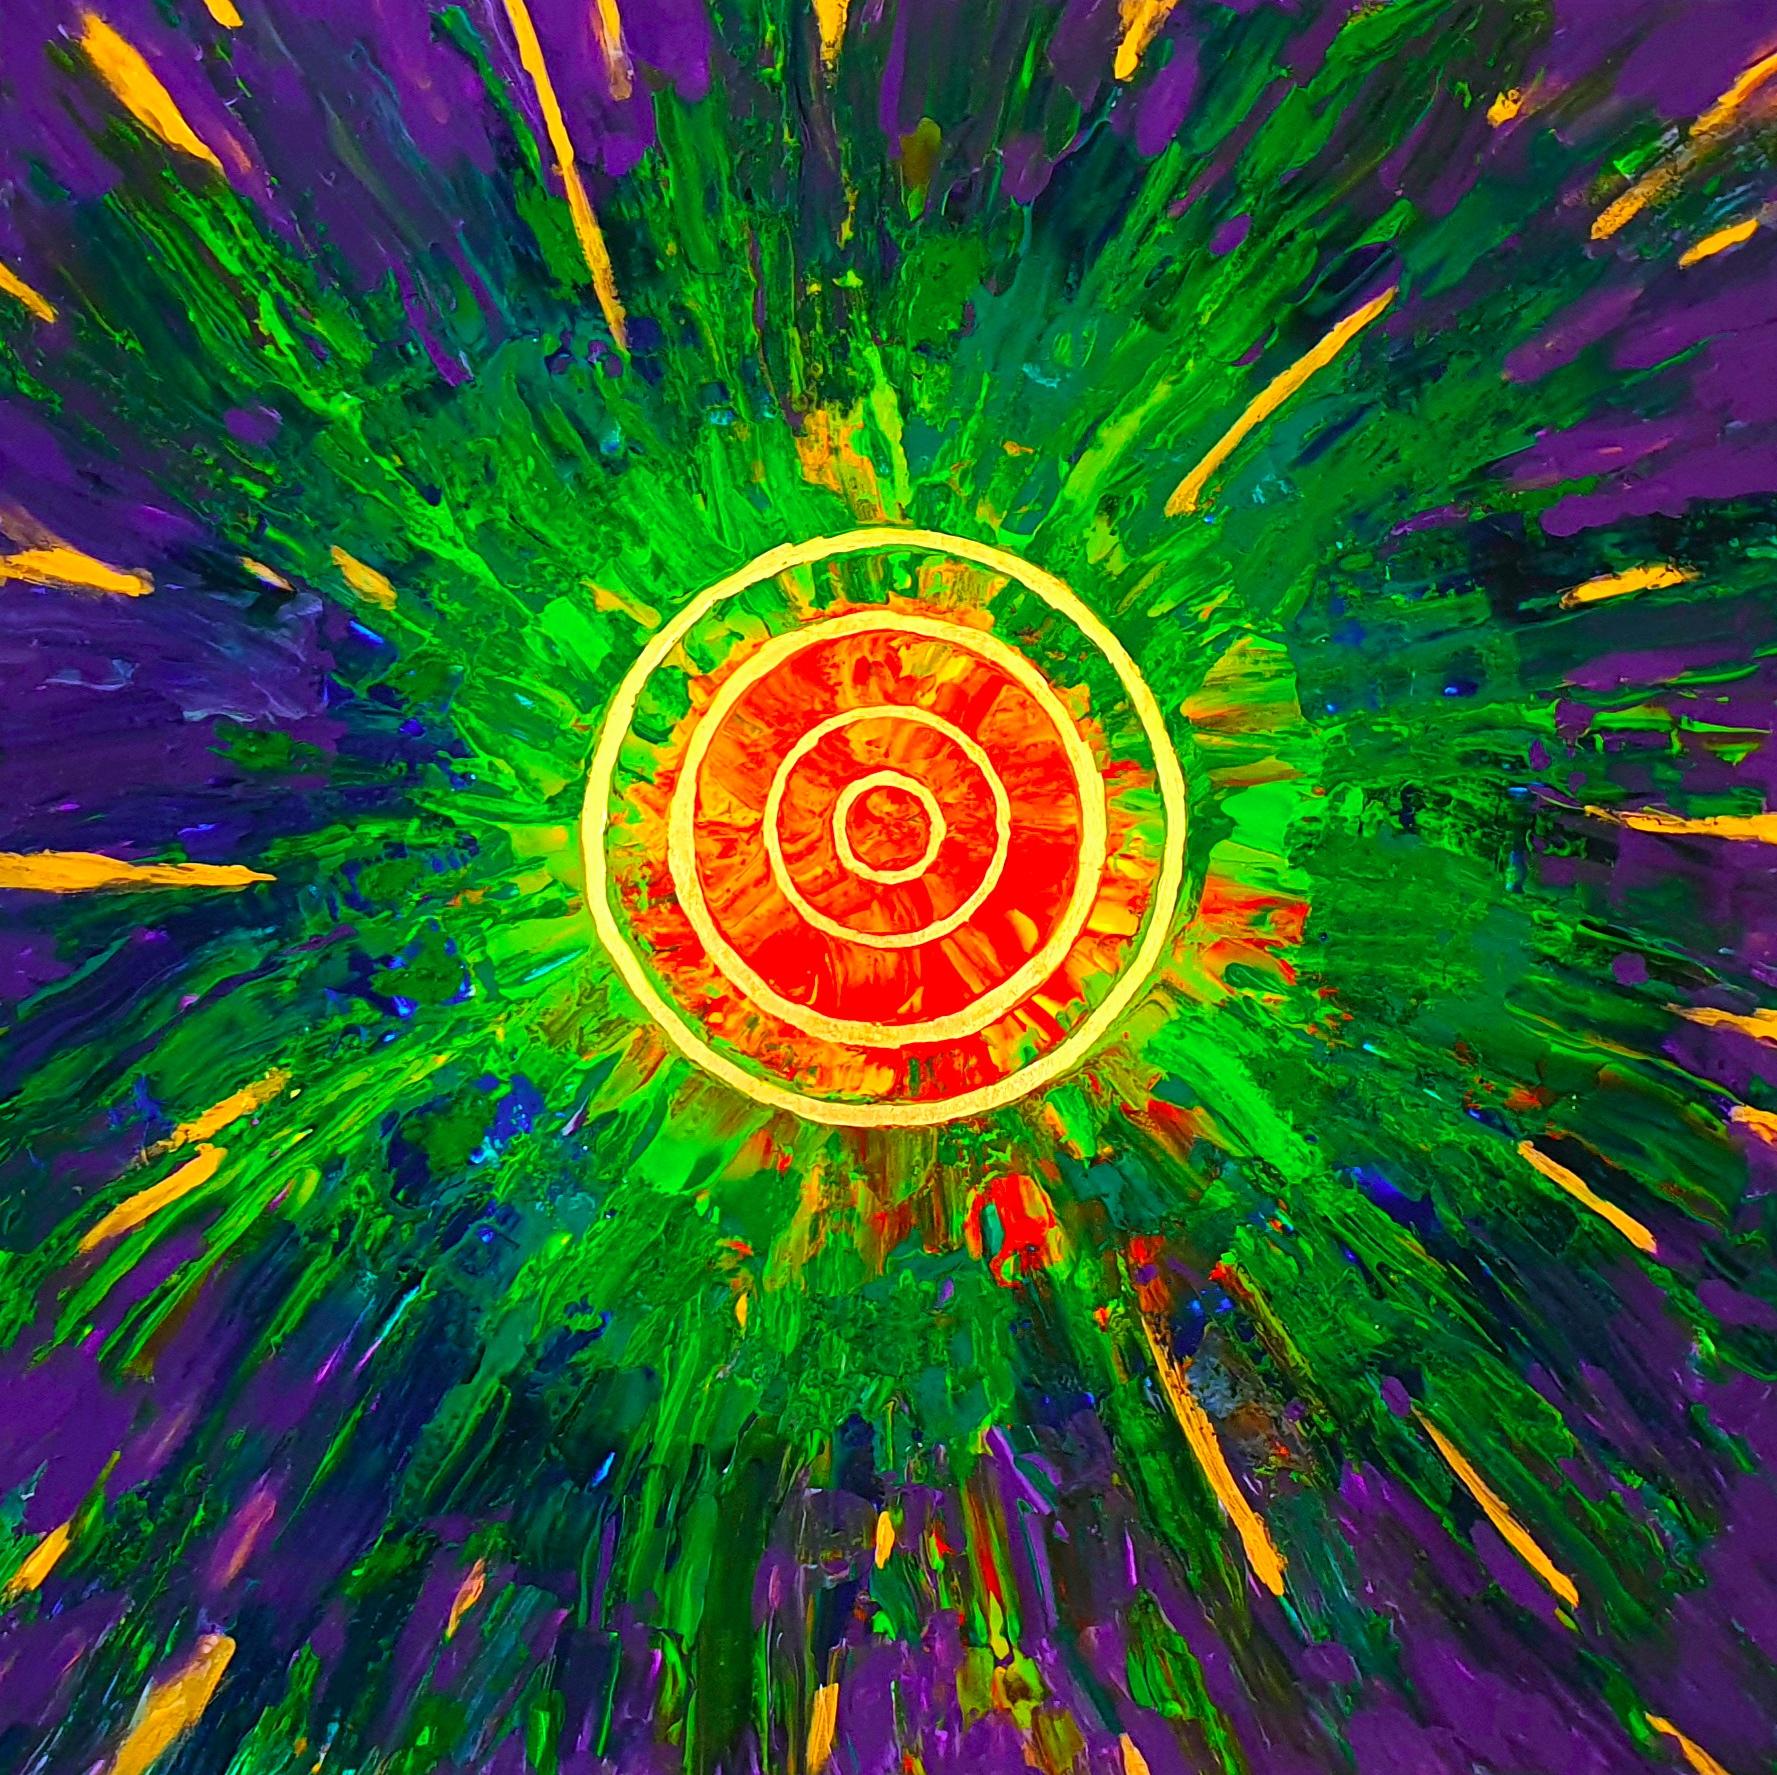 "Obraz akryl 80cm x 80cm pt. ""Solar"" (2020)"